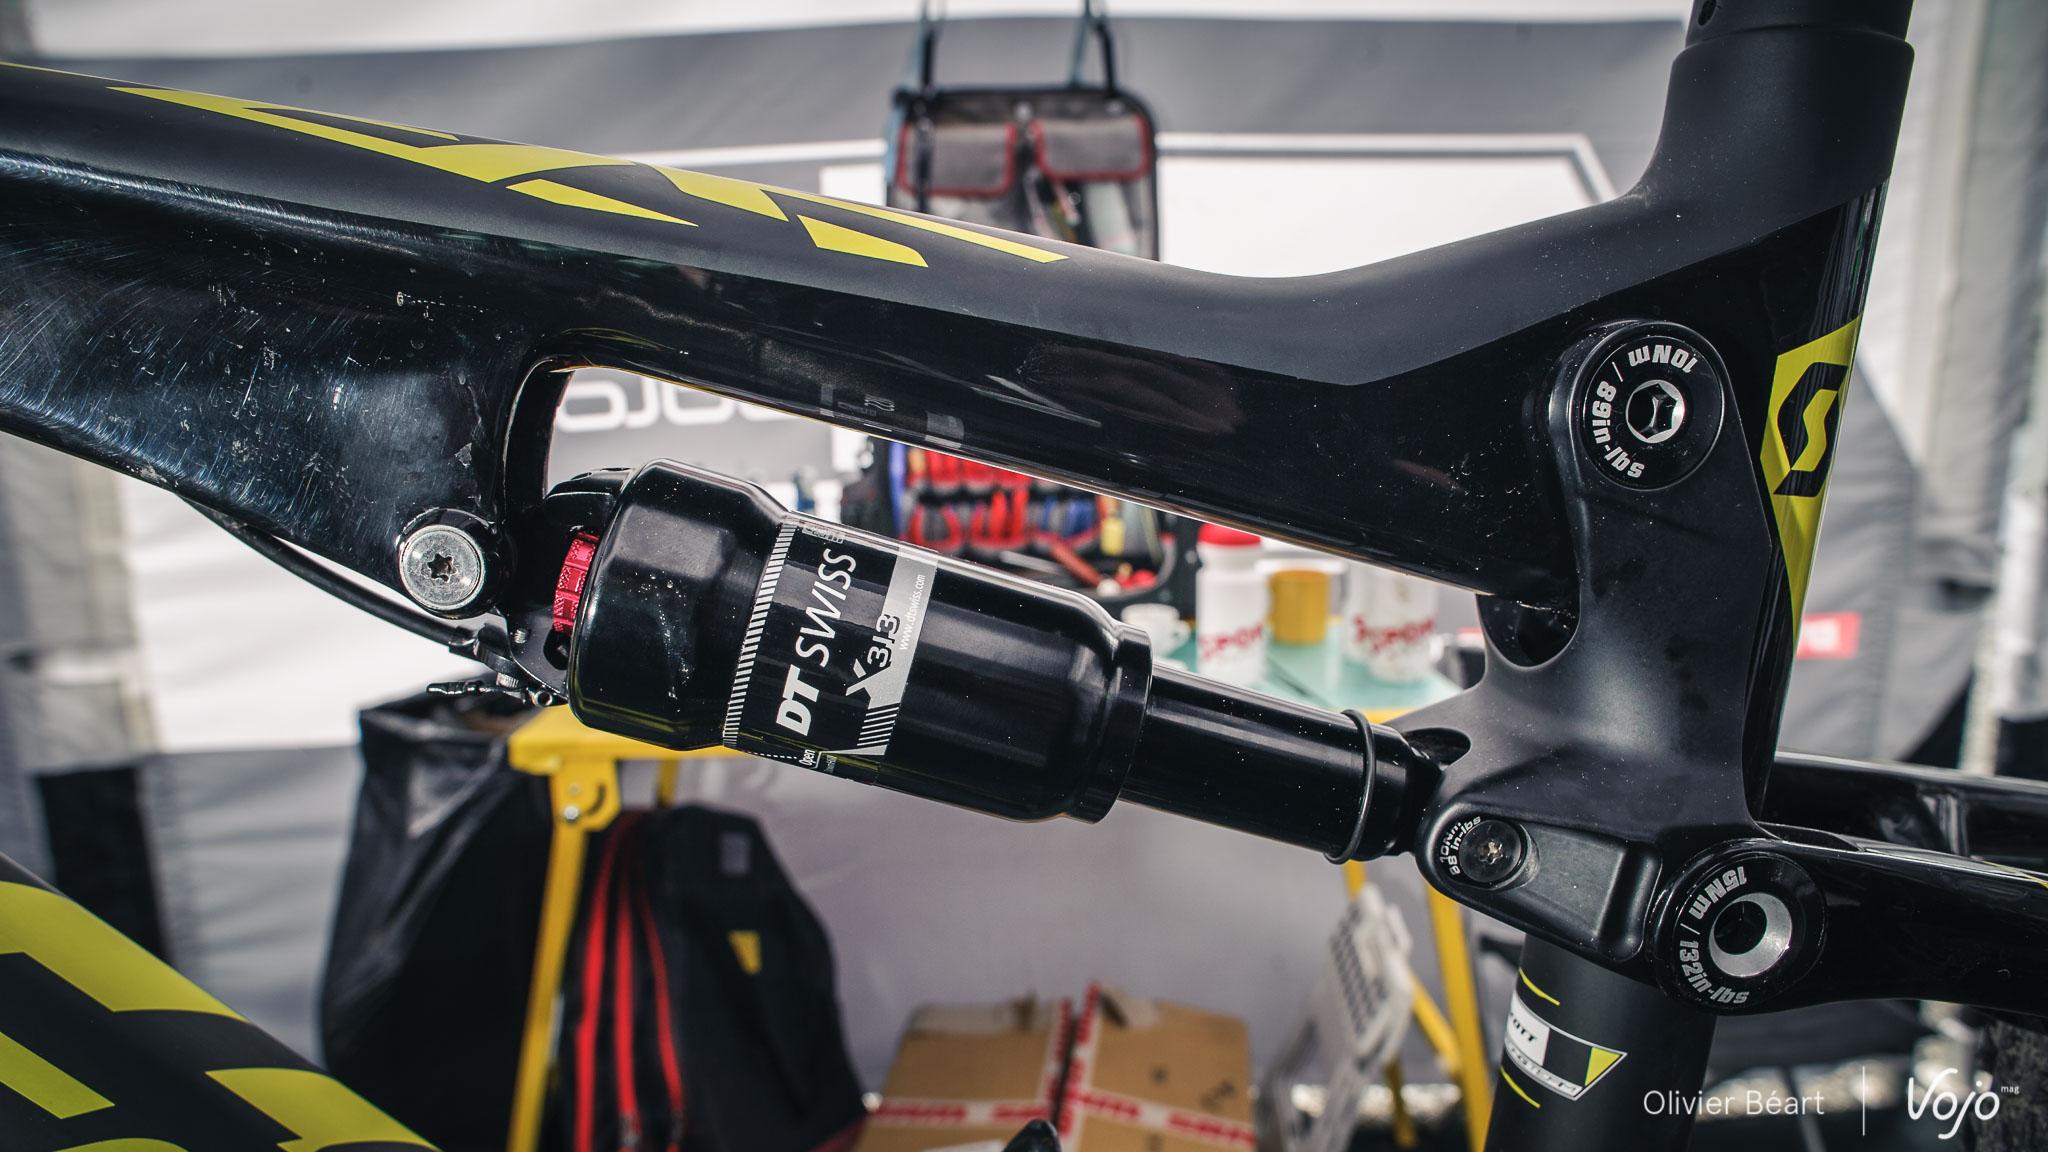 World_Cup_MTB_Pro_Bike_Check_Scott_Spark_700_Nino_Schurter_Copyright_OBeart_VojoMag-1